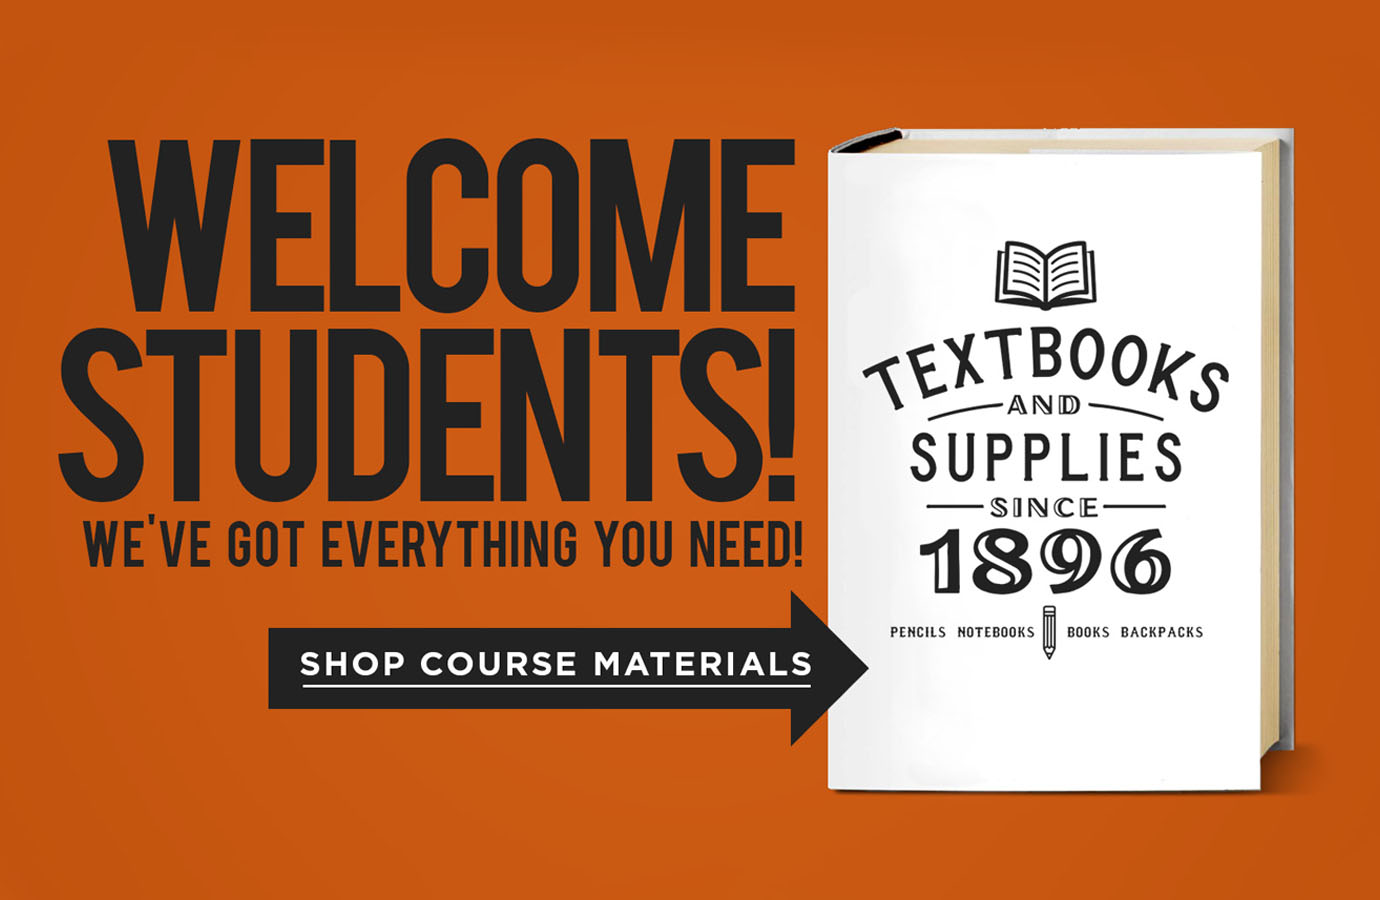 Shop Course Materials